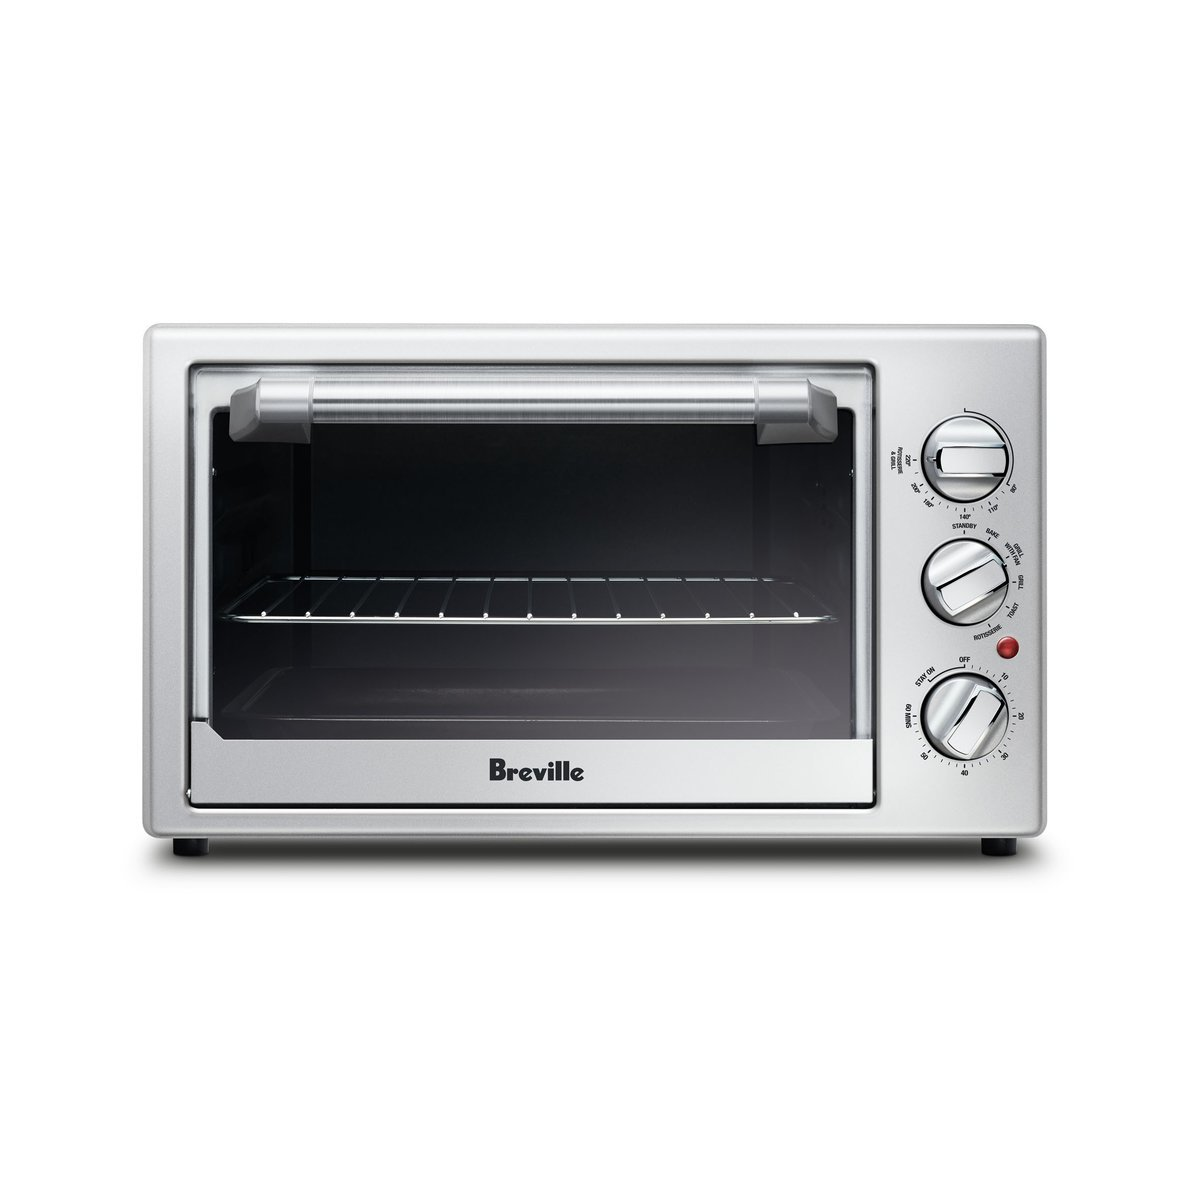 Breville LOV560 Oven